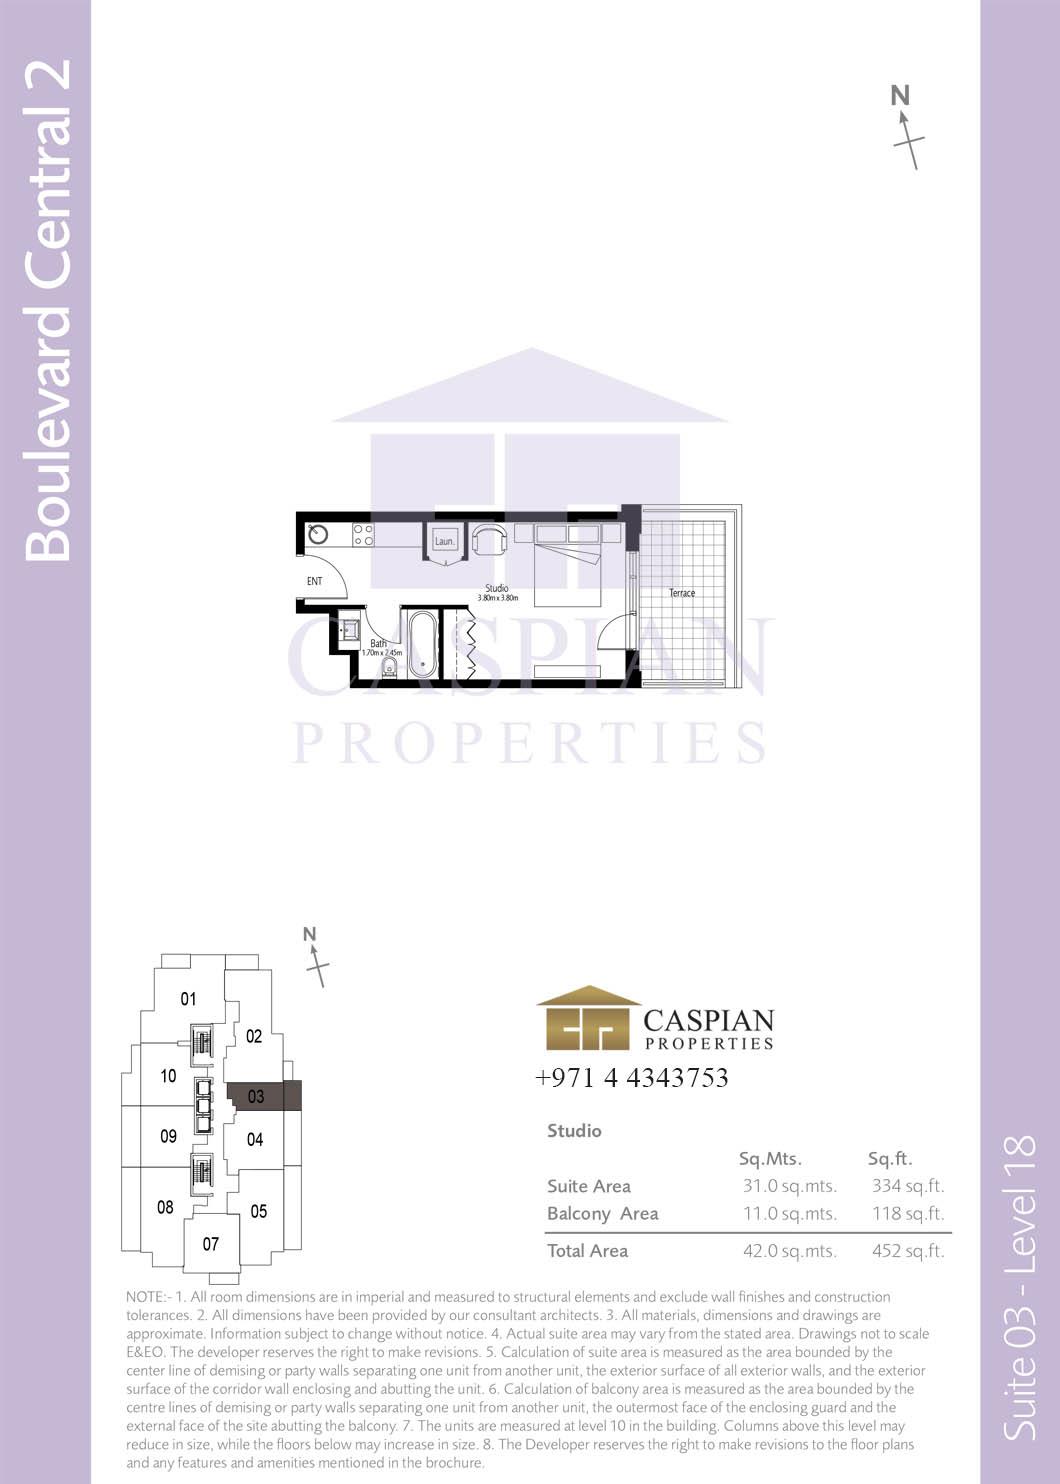 Boulevard Central Tower 2 Floor Plans